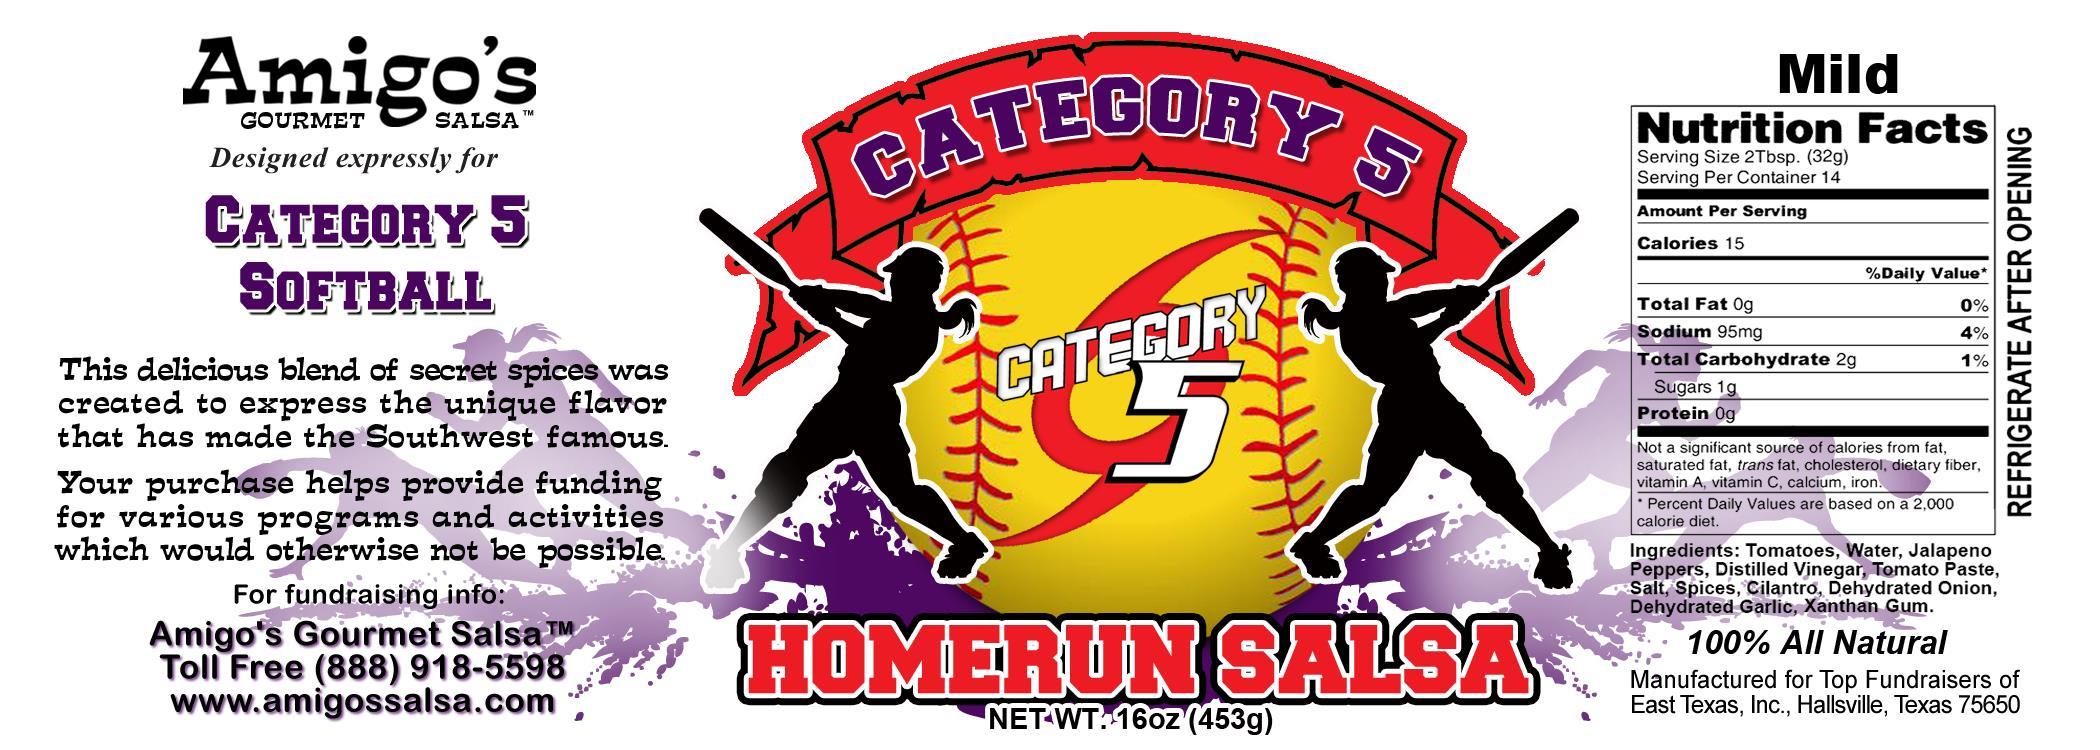 Category 5 Softball MILD.jpg